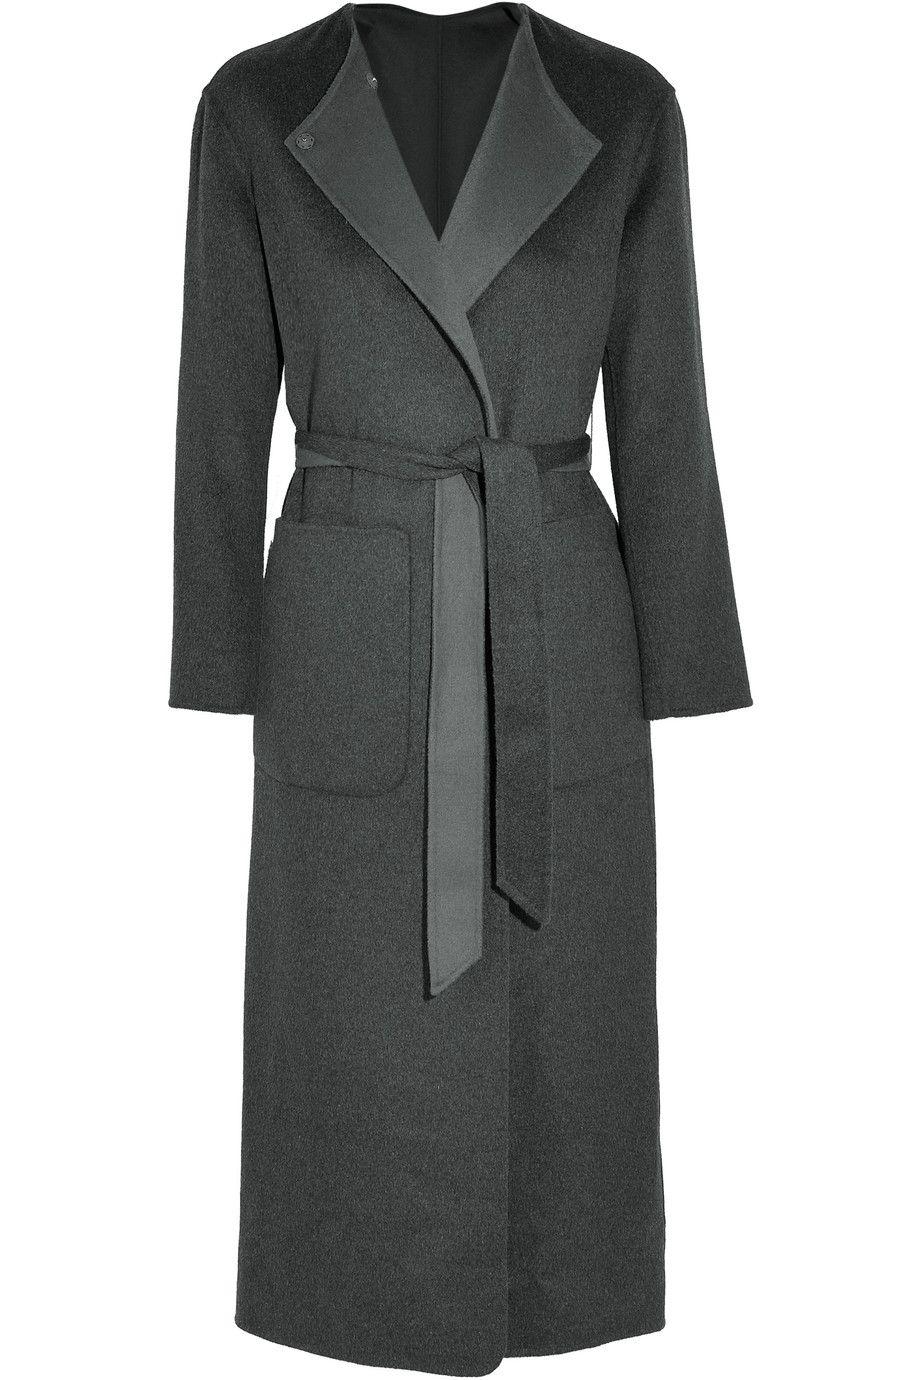 67e1ac07b762 Iris and Ink Esmeralda reversible belted cashmere coat   Пальто ...